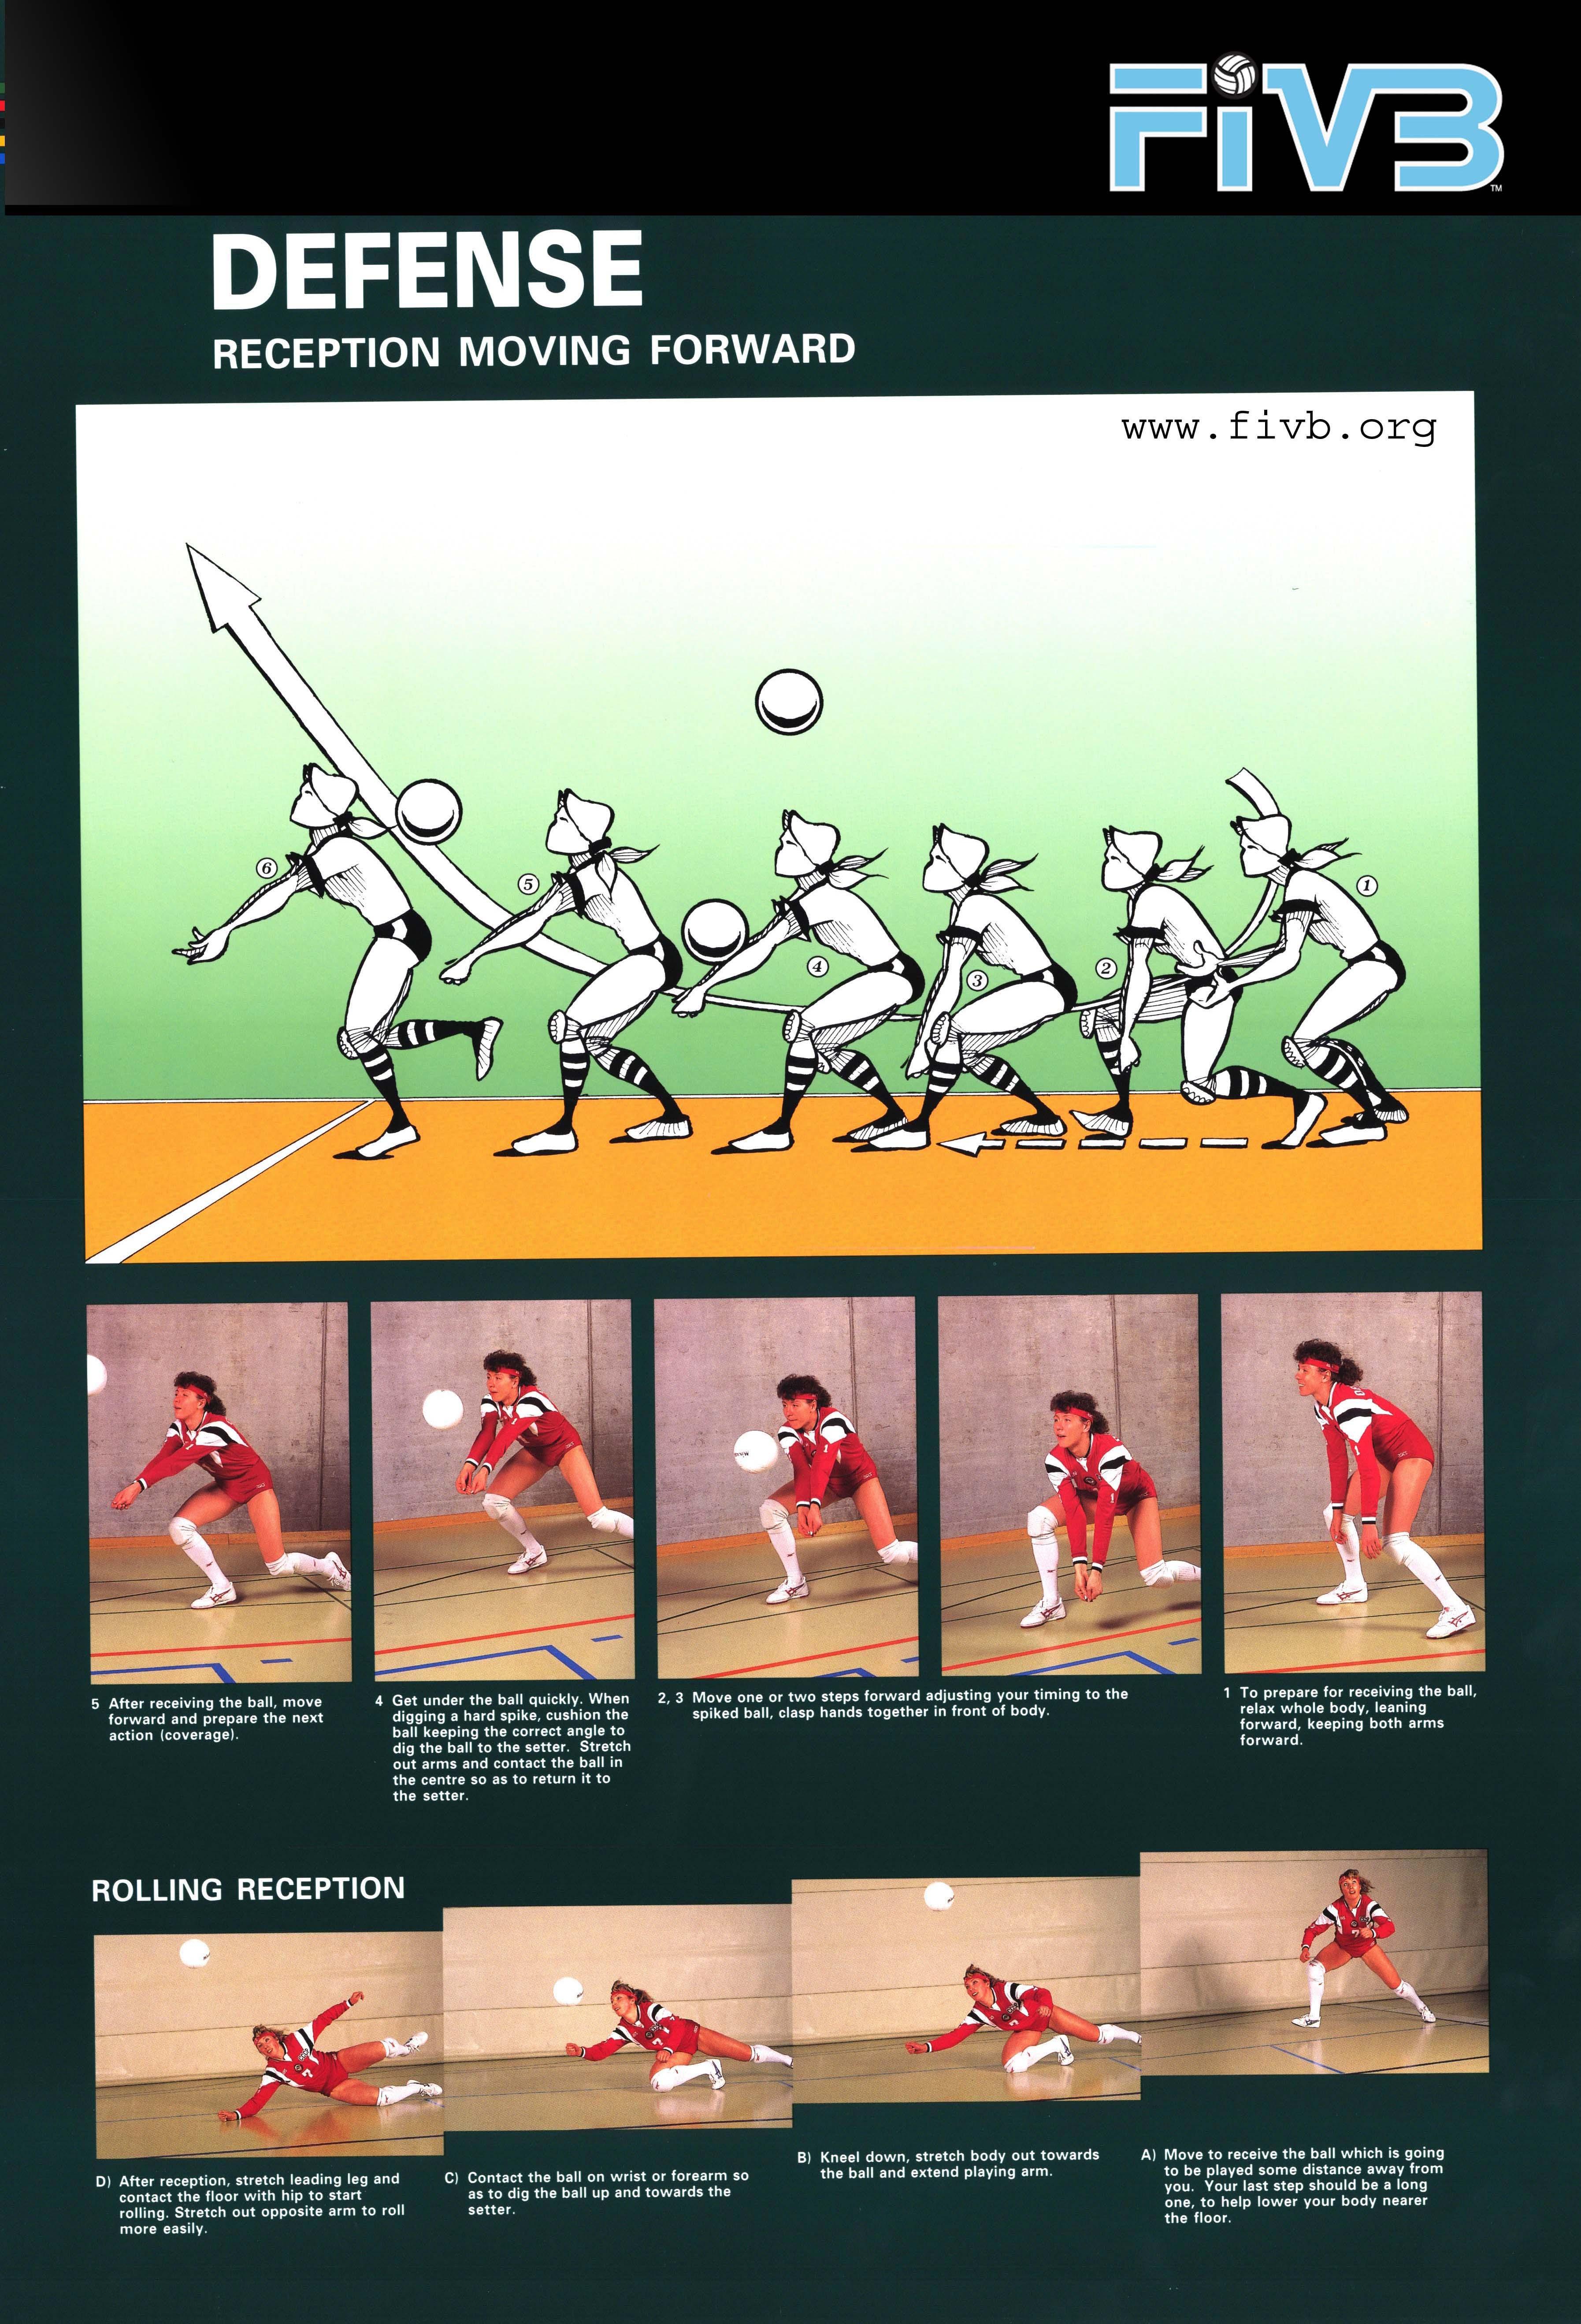 fivb官方排球技术图示教学